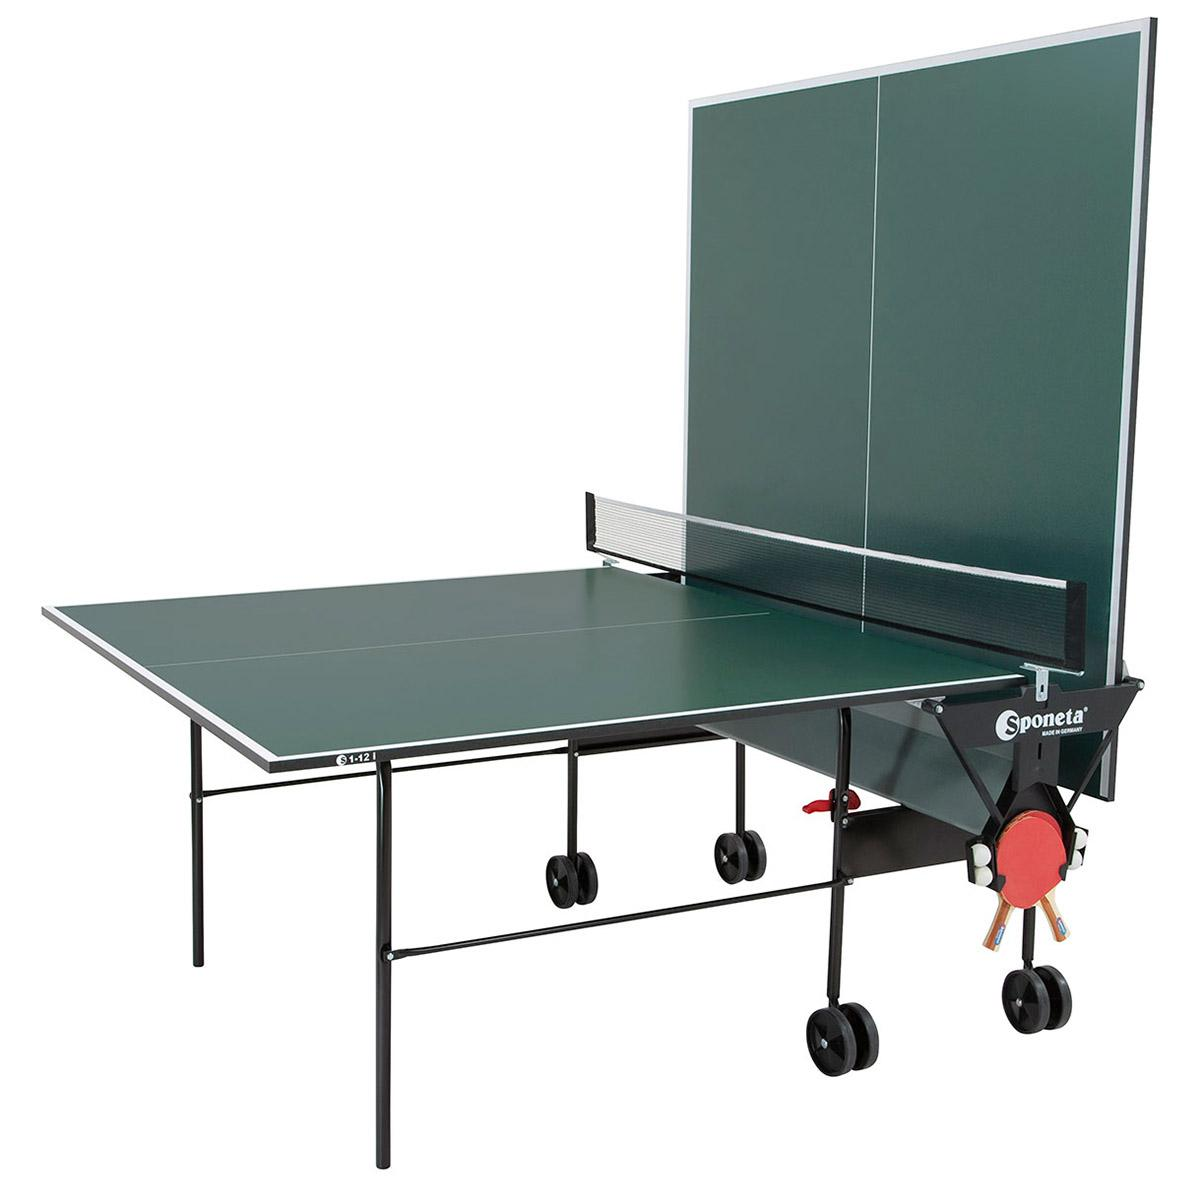 Sponeta hobbyline playback 19mm indoor table tennis table green - Sponeta table tennis table ...